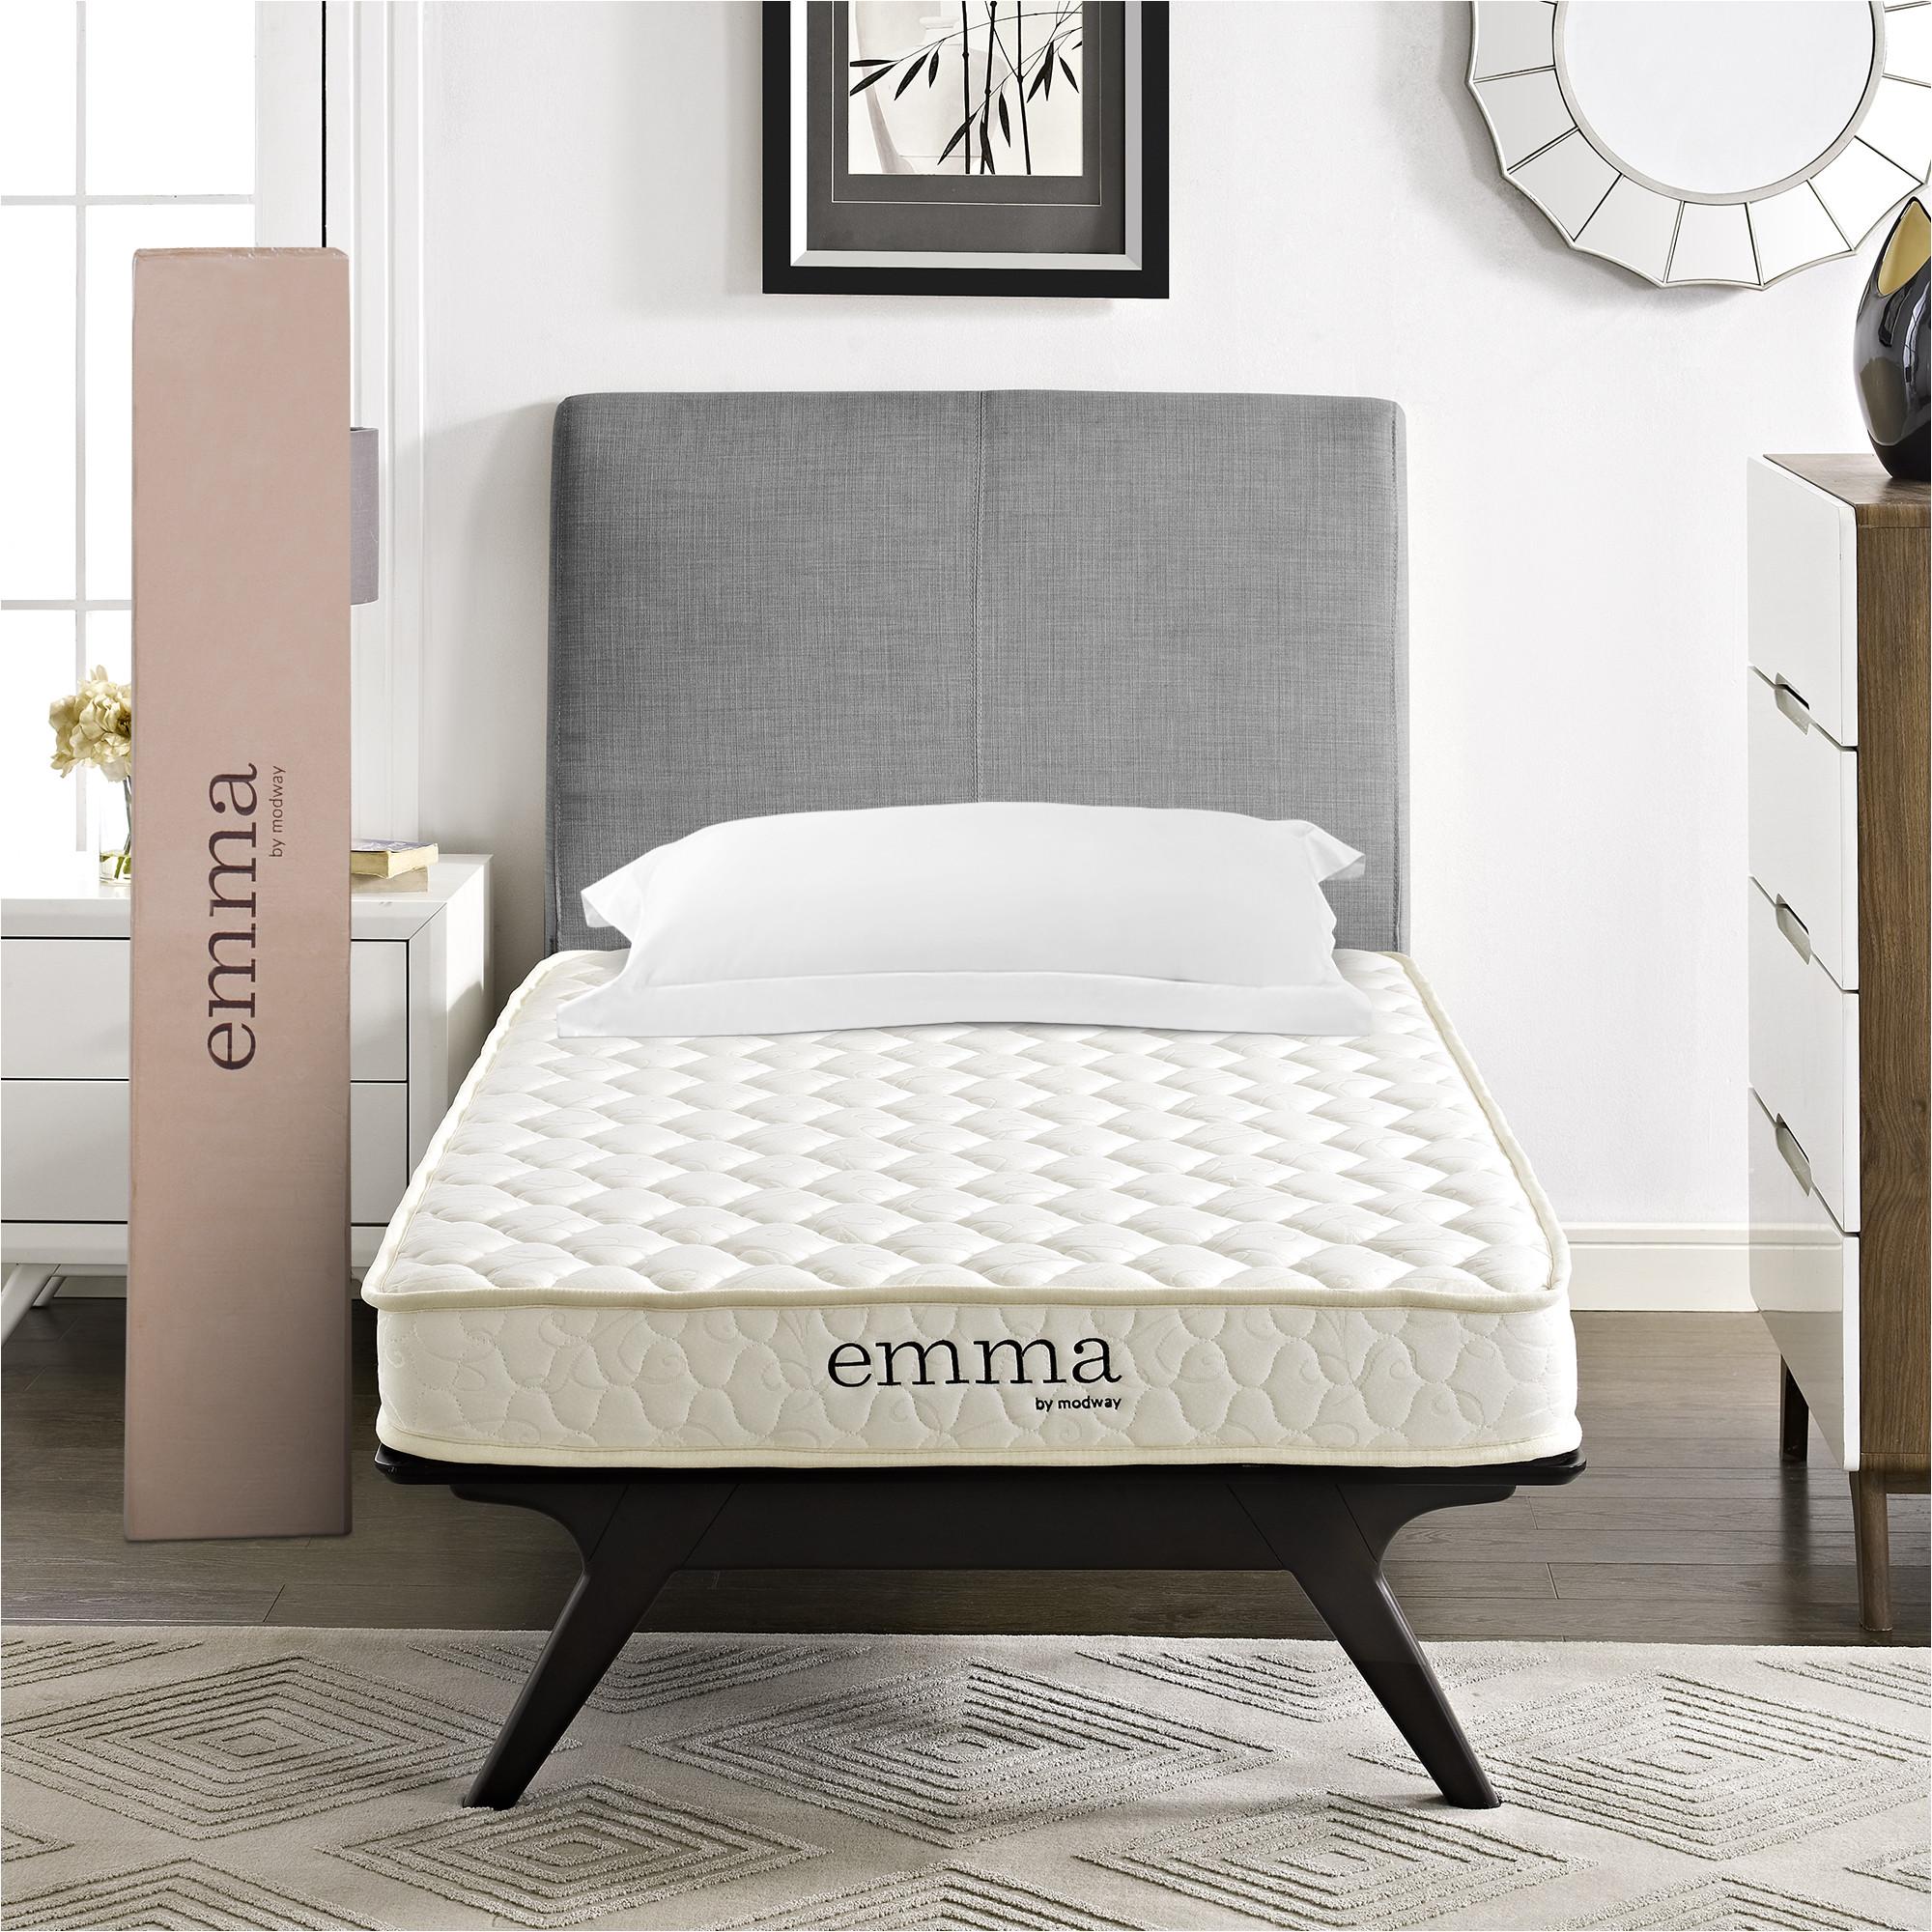 modway emma 6 two layer memory foam mattress multiple sizes walmart com